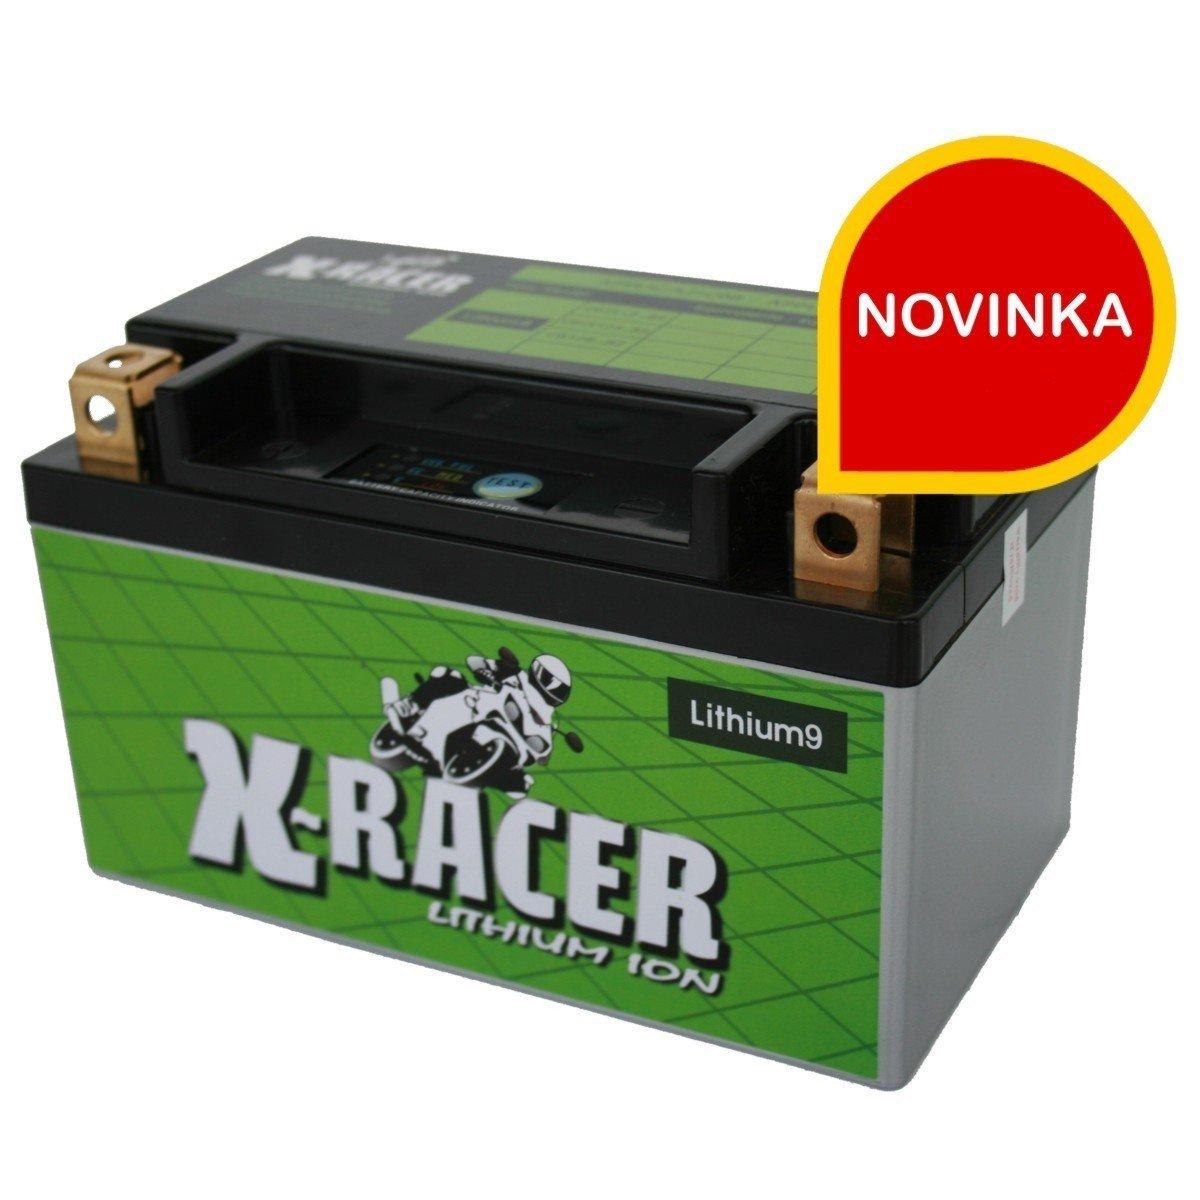 X-RACER Lithium9